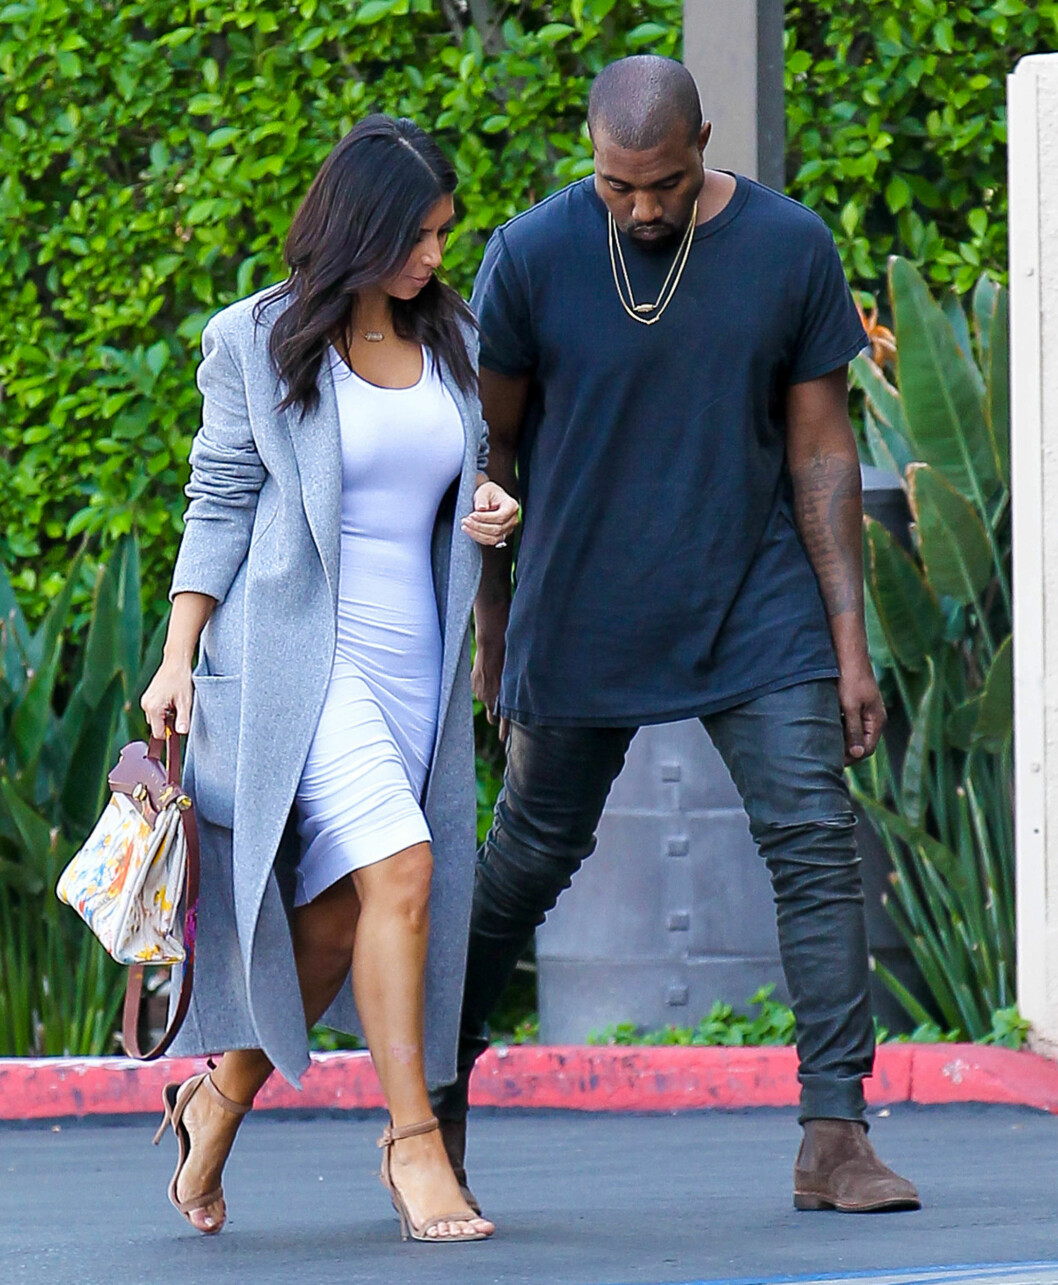 TRAVELT PAR: Kim Kardashian og Kanye West har en datter sammen, men ekteparet har likevel svært individuelle timeplaner. Her er de avbildet sammen i november, Kim med en Hermés-veske dekorert med Noris fingermaleri. Foto: Stella Pictures